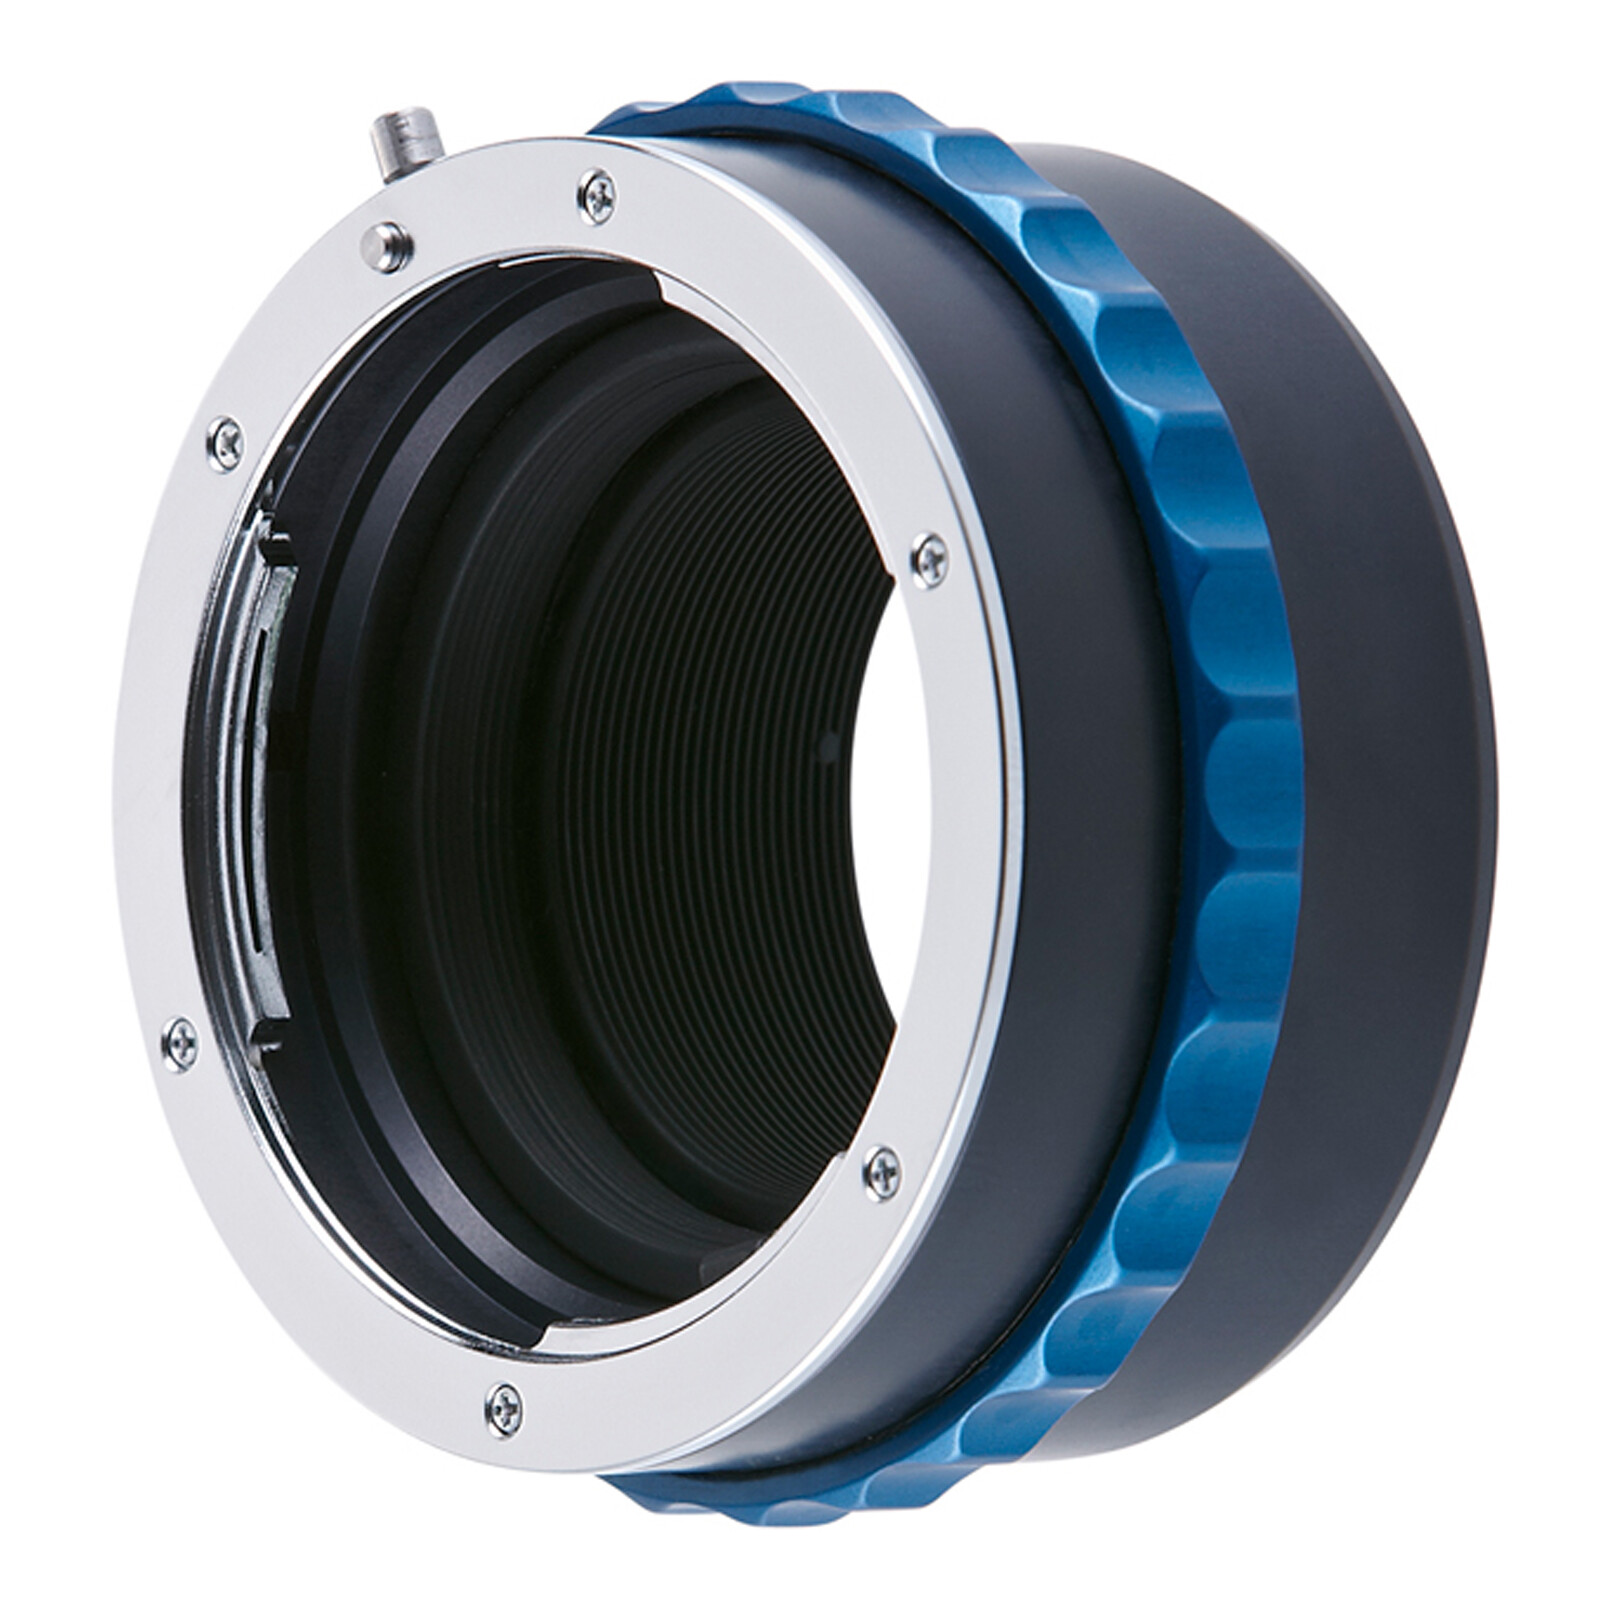 Novoflex EOSM/NIK Adapter